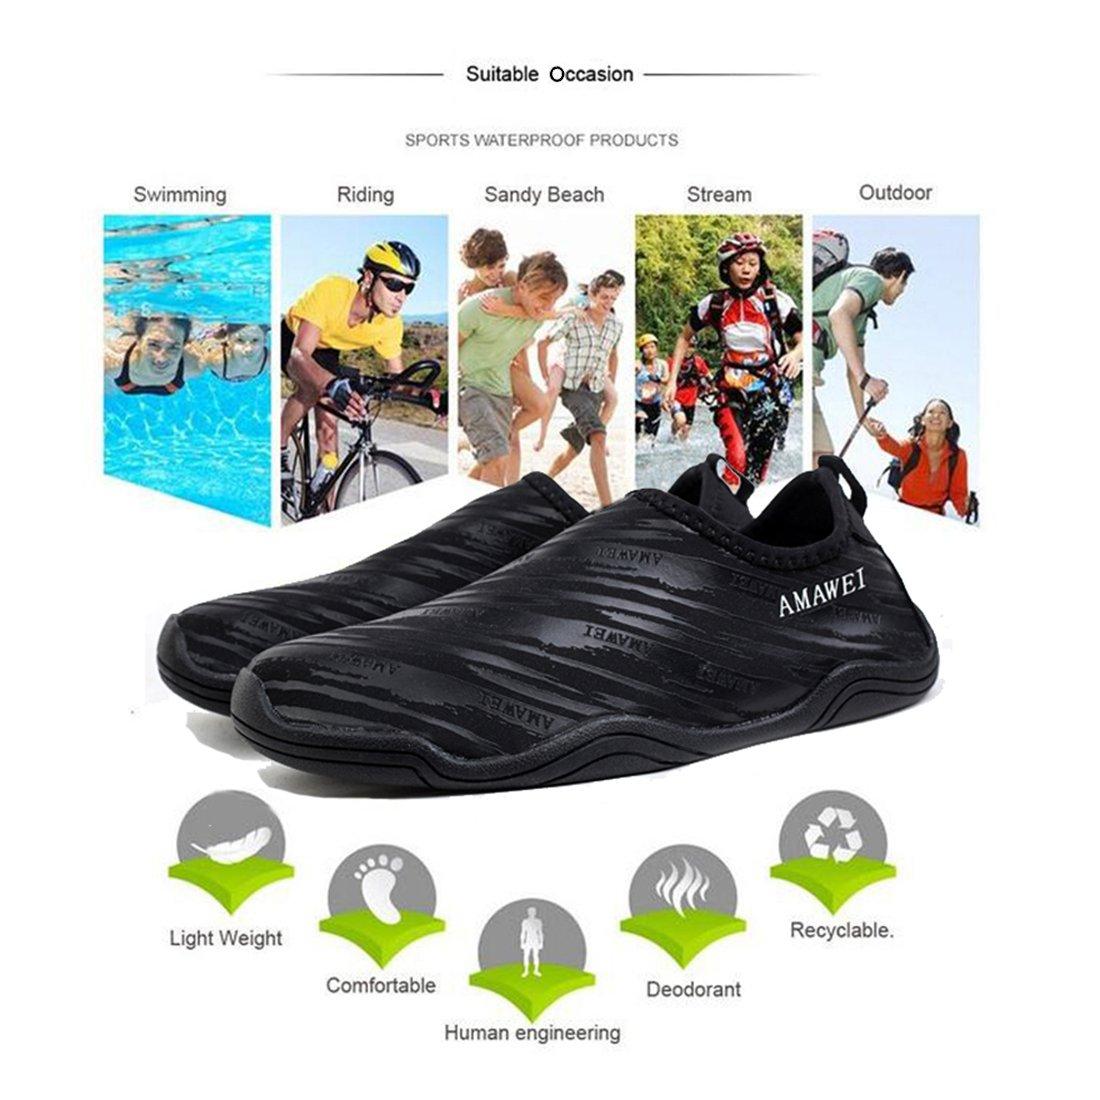 AMAWEI Water Shoes Quick for Boys Girls Kids Quick Shoes Dry Beach Swim Sports Aqua Shoes for Pool Surfing Walking B07CNN1HXG 7 M US Big Kids/9 (B) M Women Black c9df42